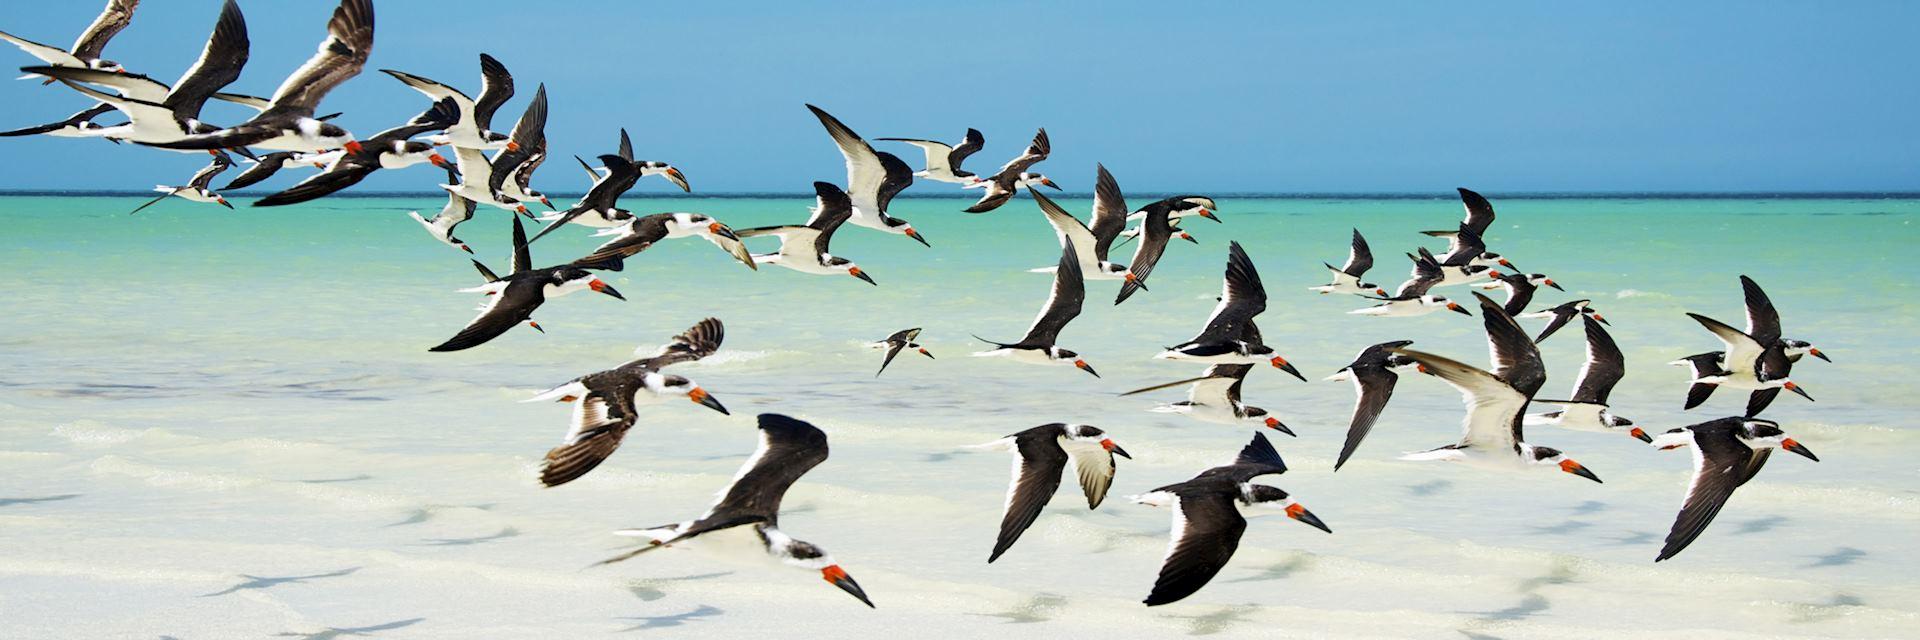 Wildlife on Holbox Island, Mexico